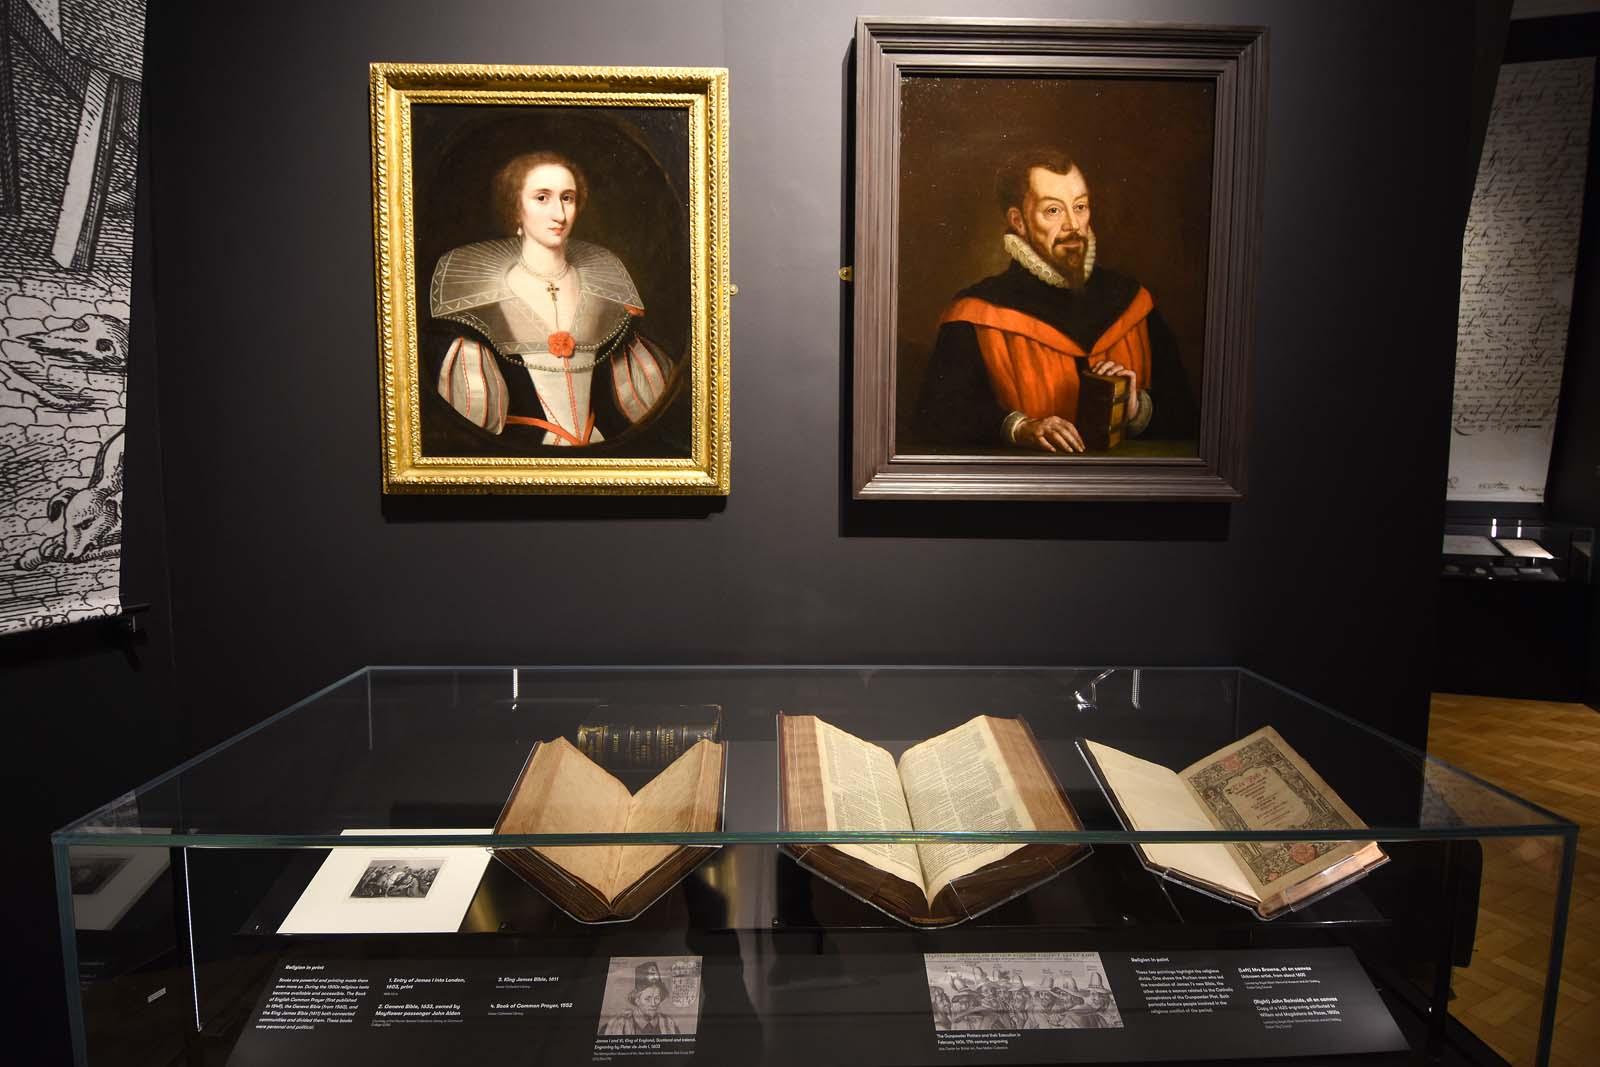 gallerty photo showing manuscripts and Elizabethan era portraits